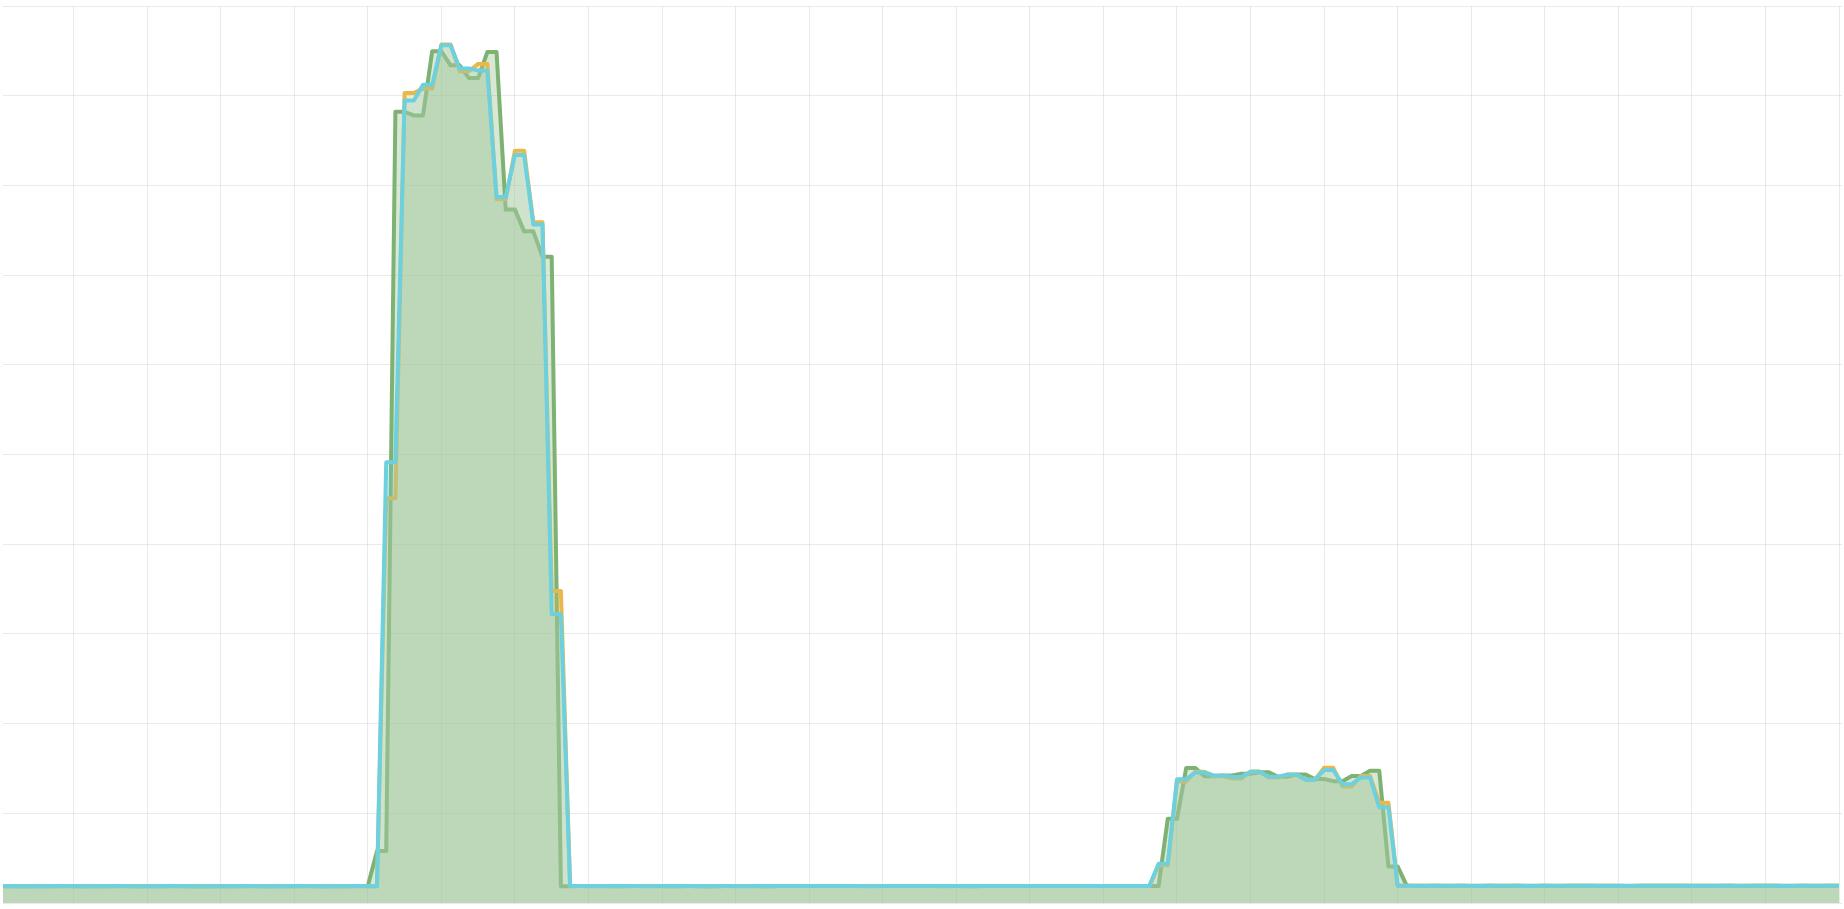 plot showing ingestion rate limit change